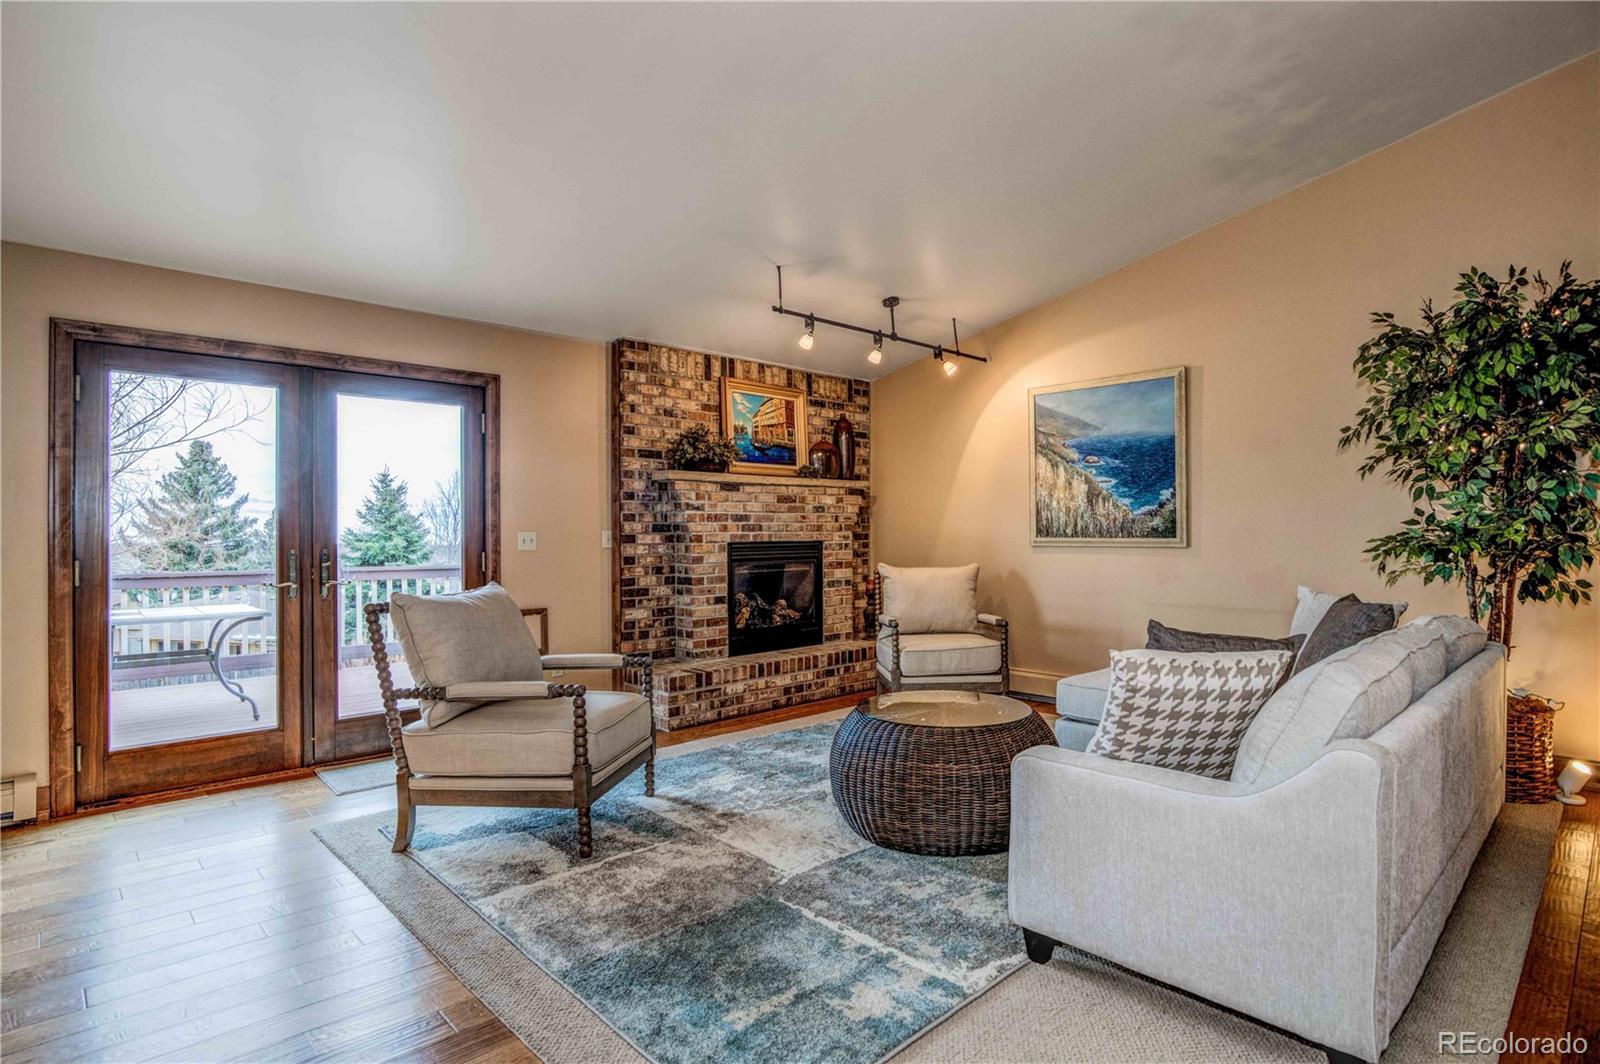 MLS# 5539974 - 8 - 5505 Saddle Rock Place, Colorado Springs, CO 80918